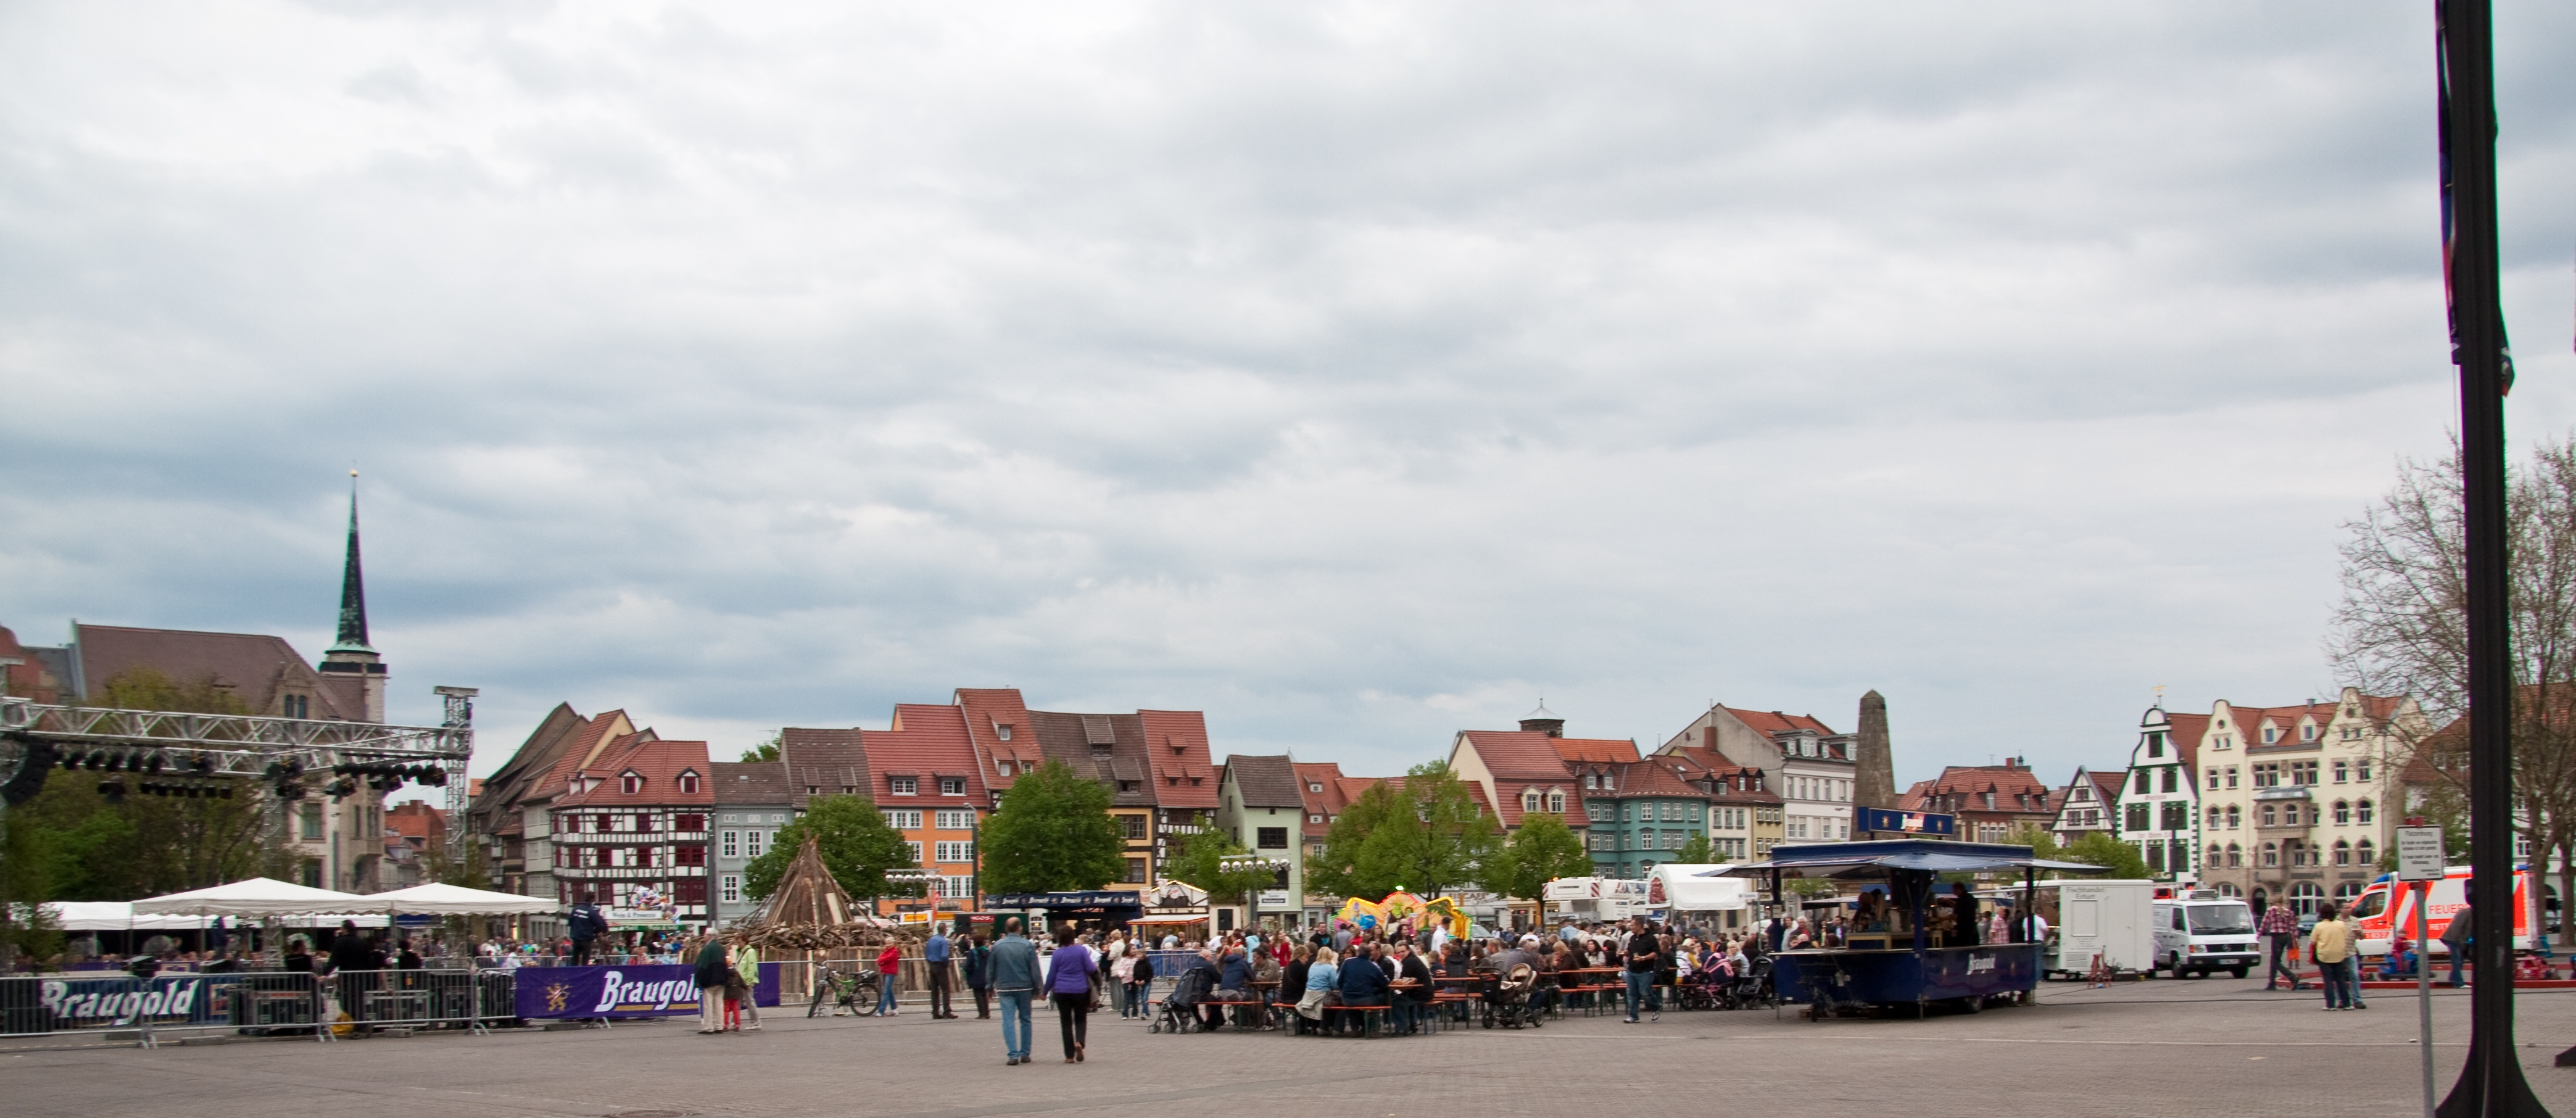 Walpurgisnacht in Erfurt 2010